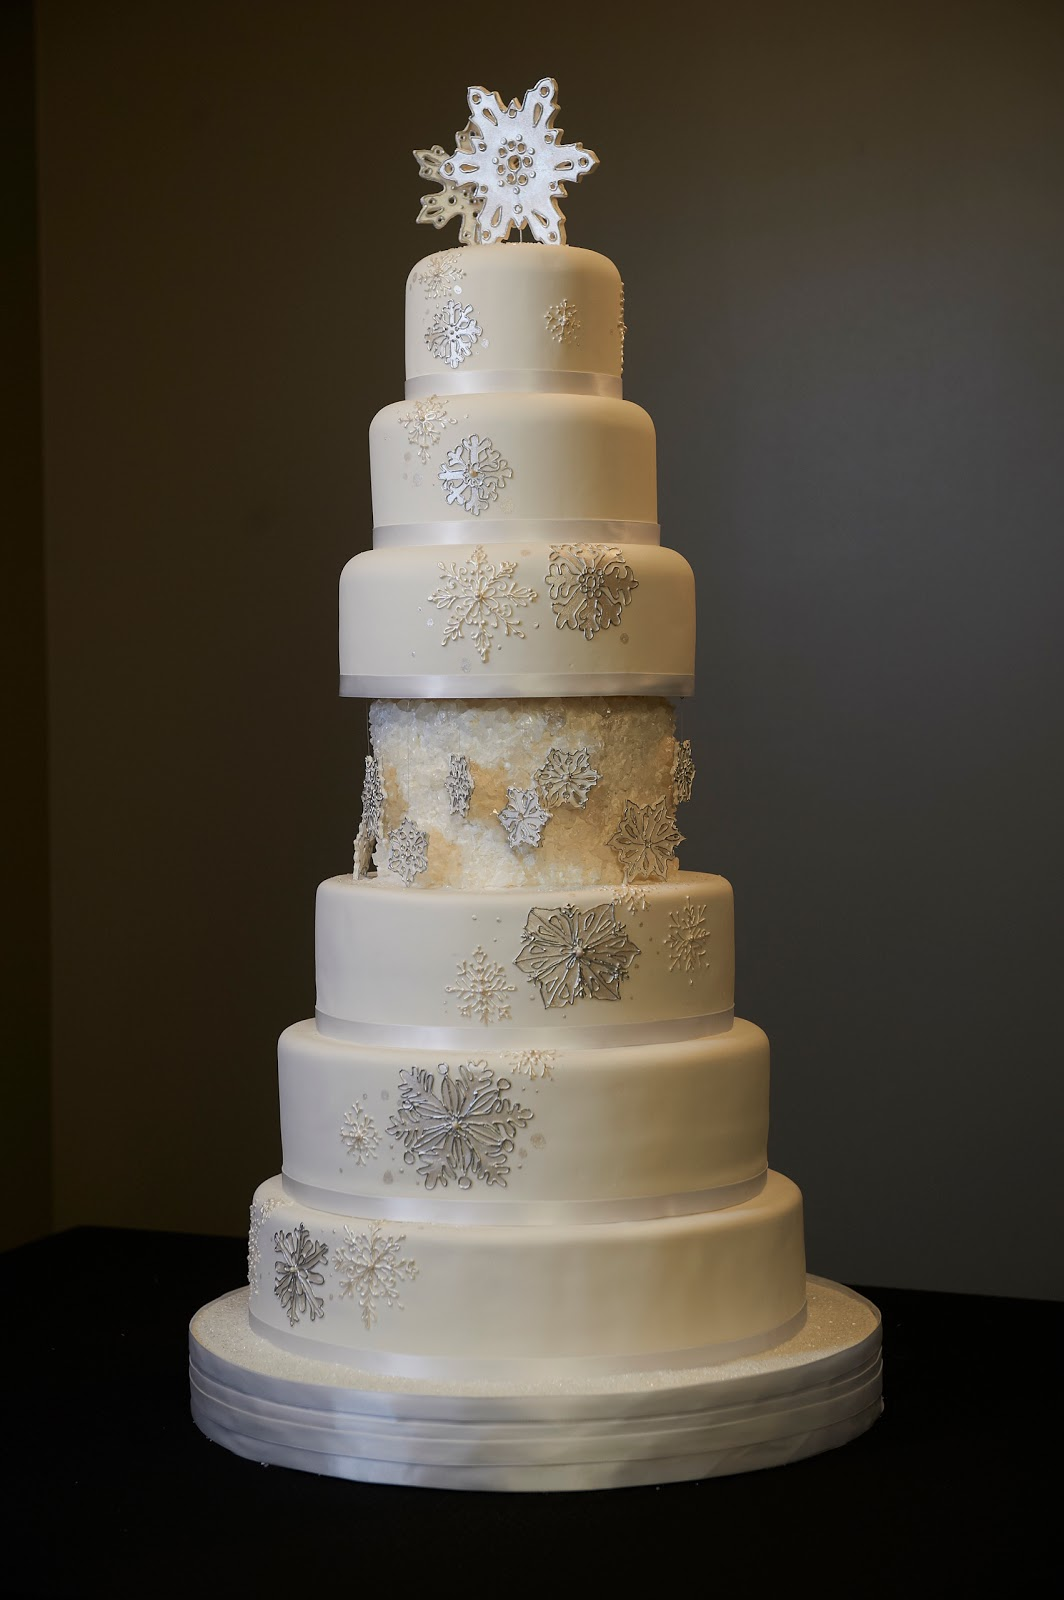 of Amazing Wedding Cakes